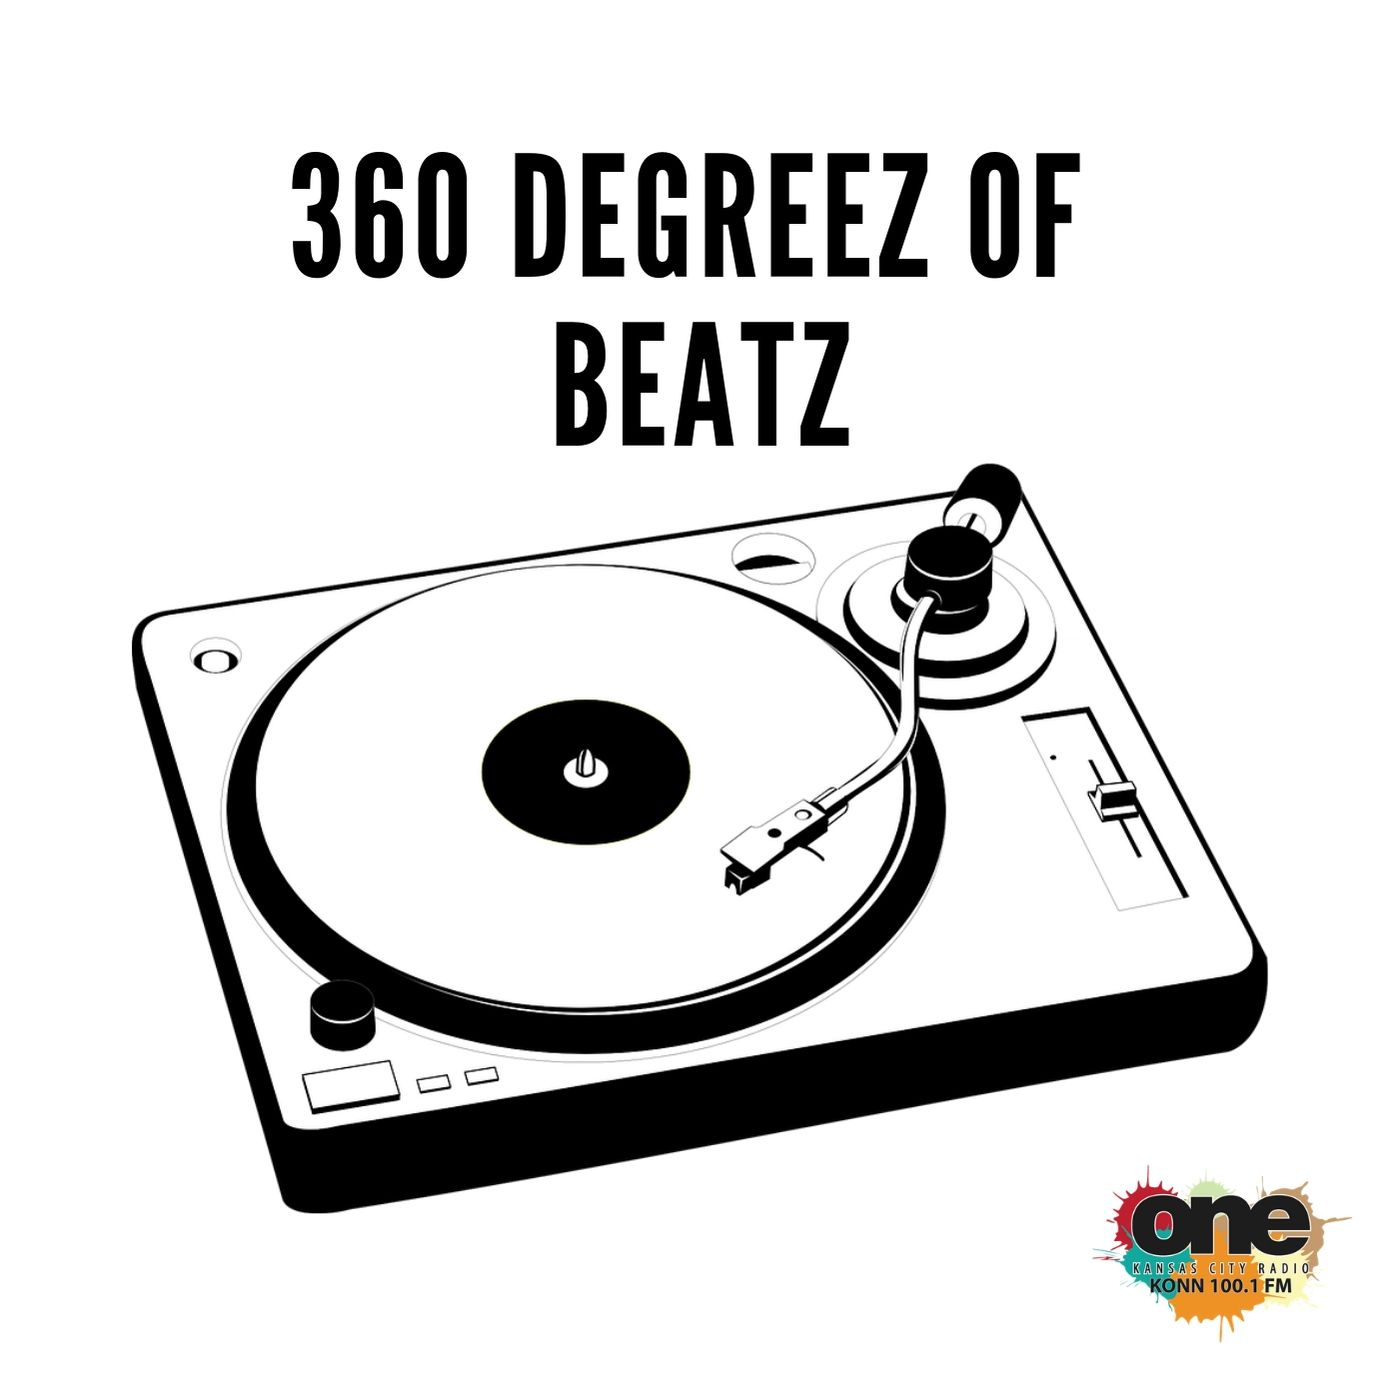 DJ 360 Degreez of Beatz - August 2, 2019